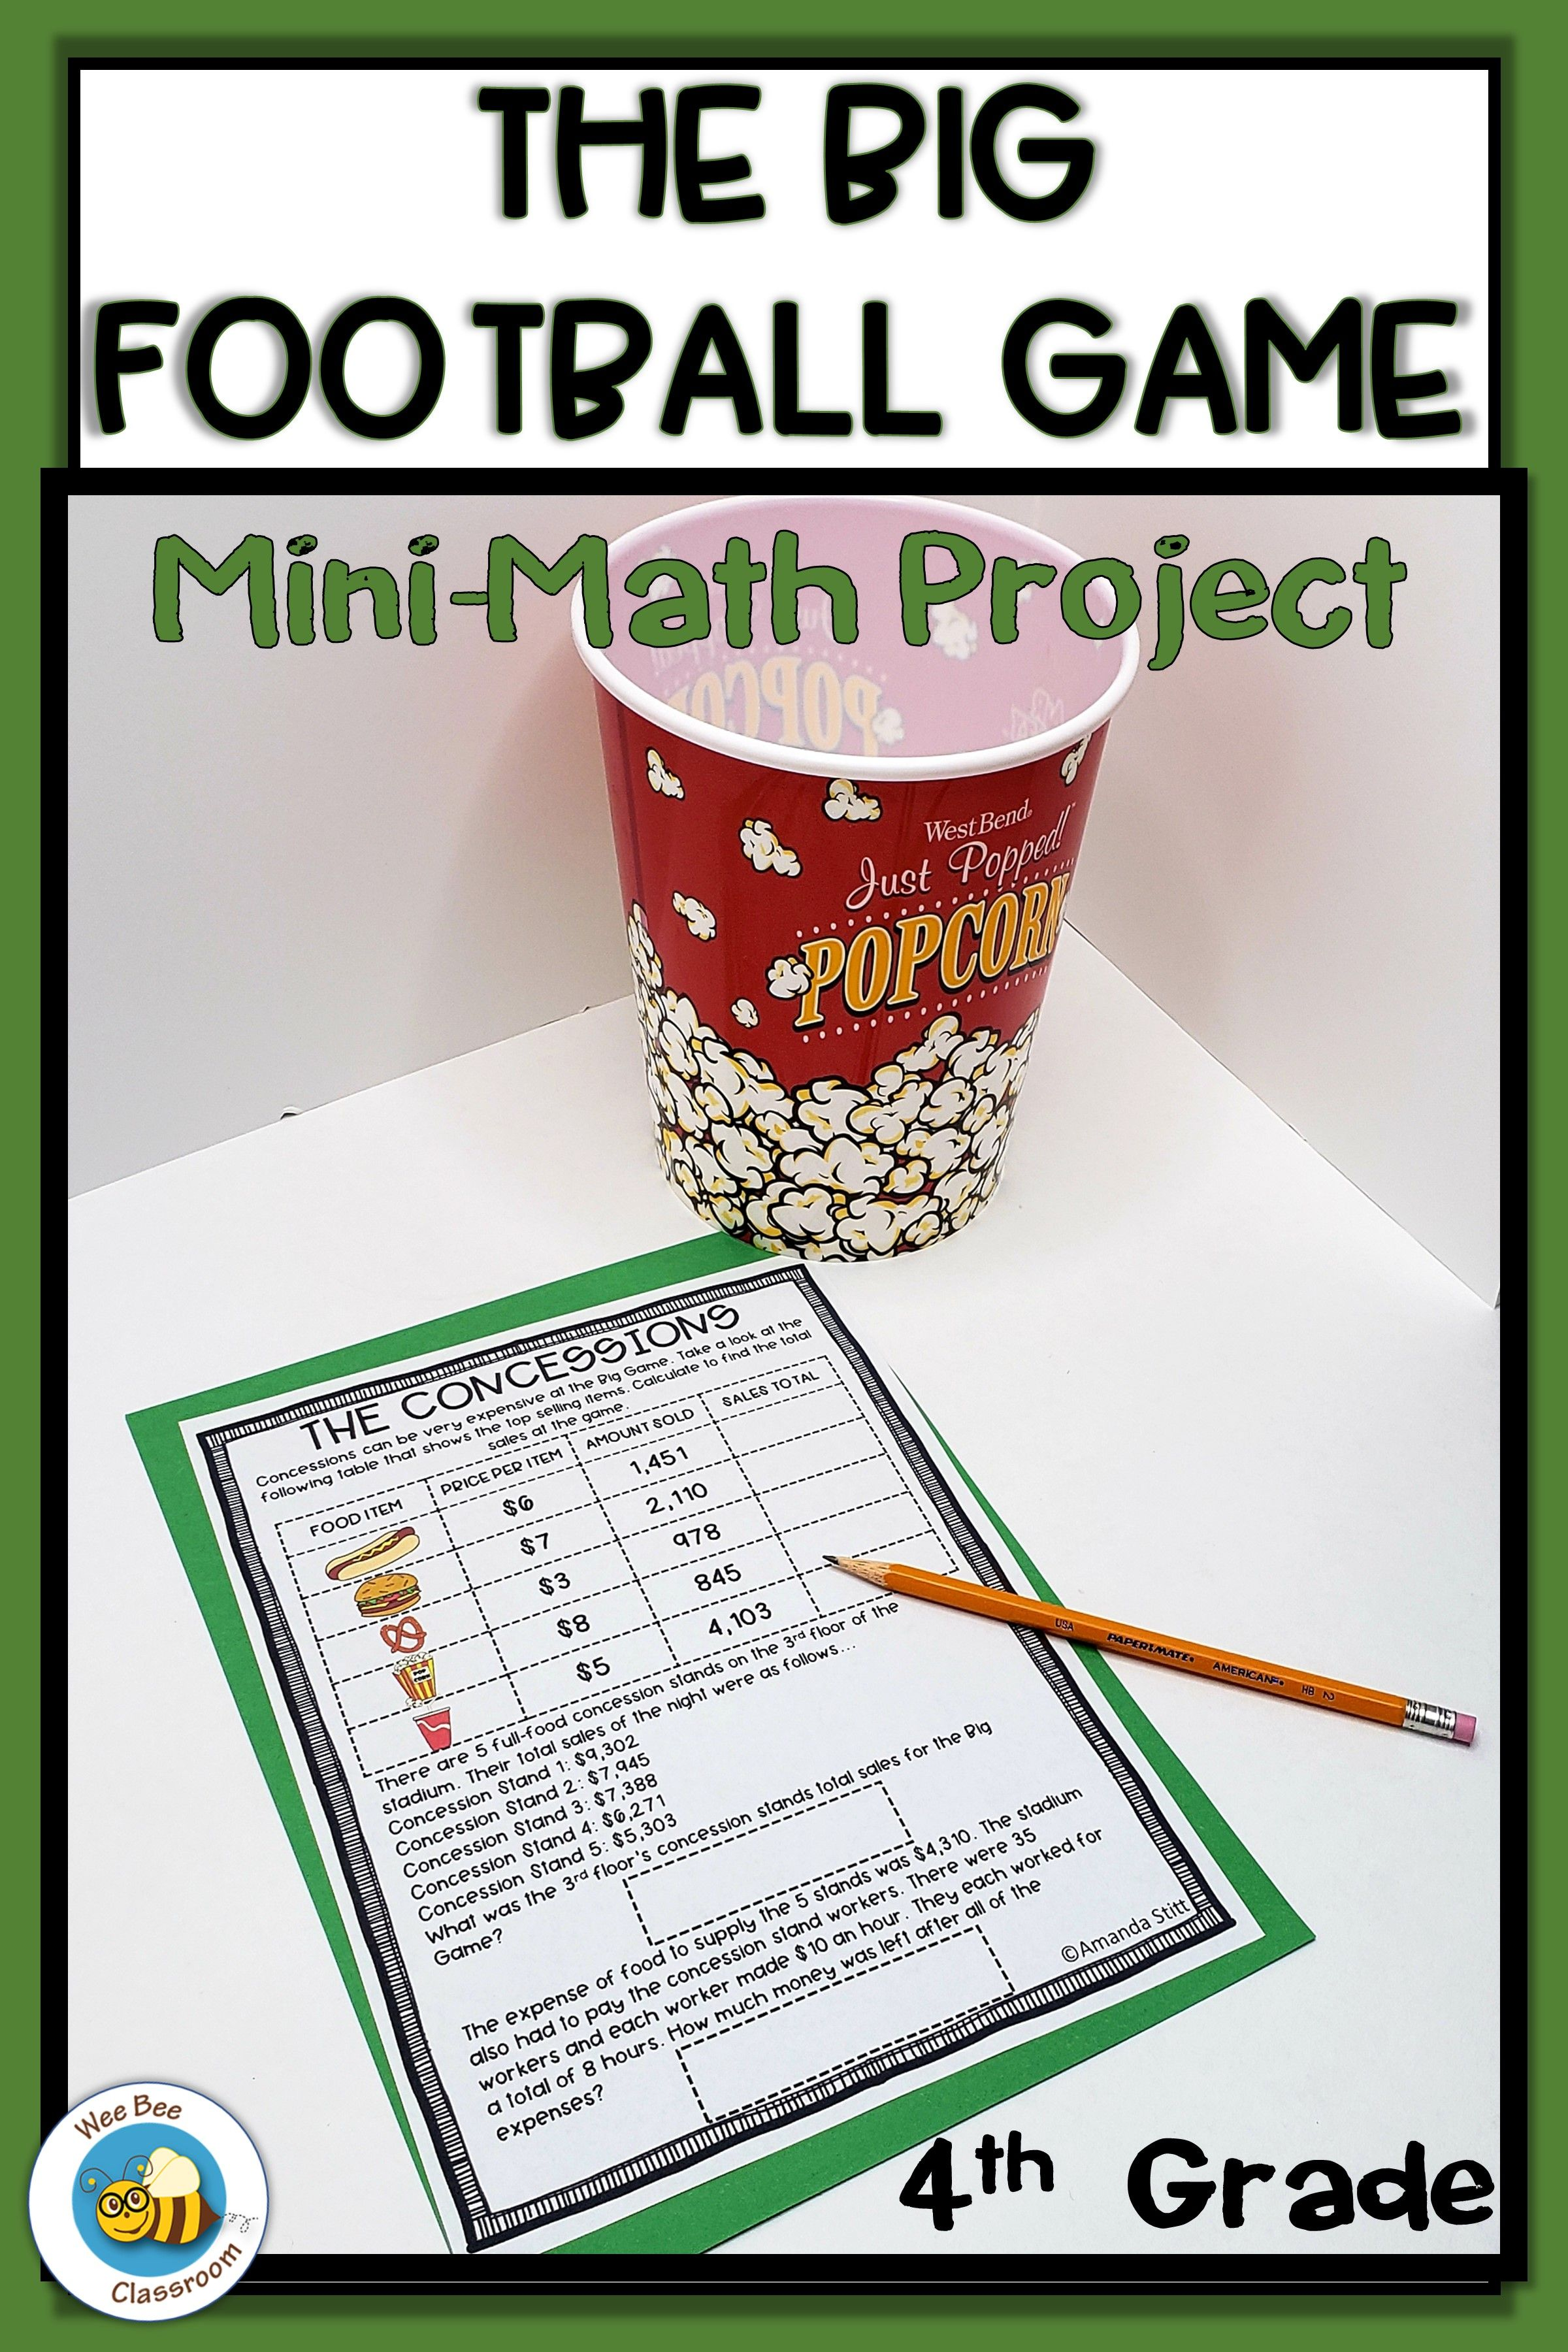 4th Grade Big Football Game Math Project